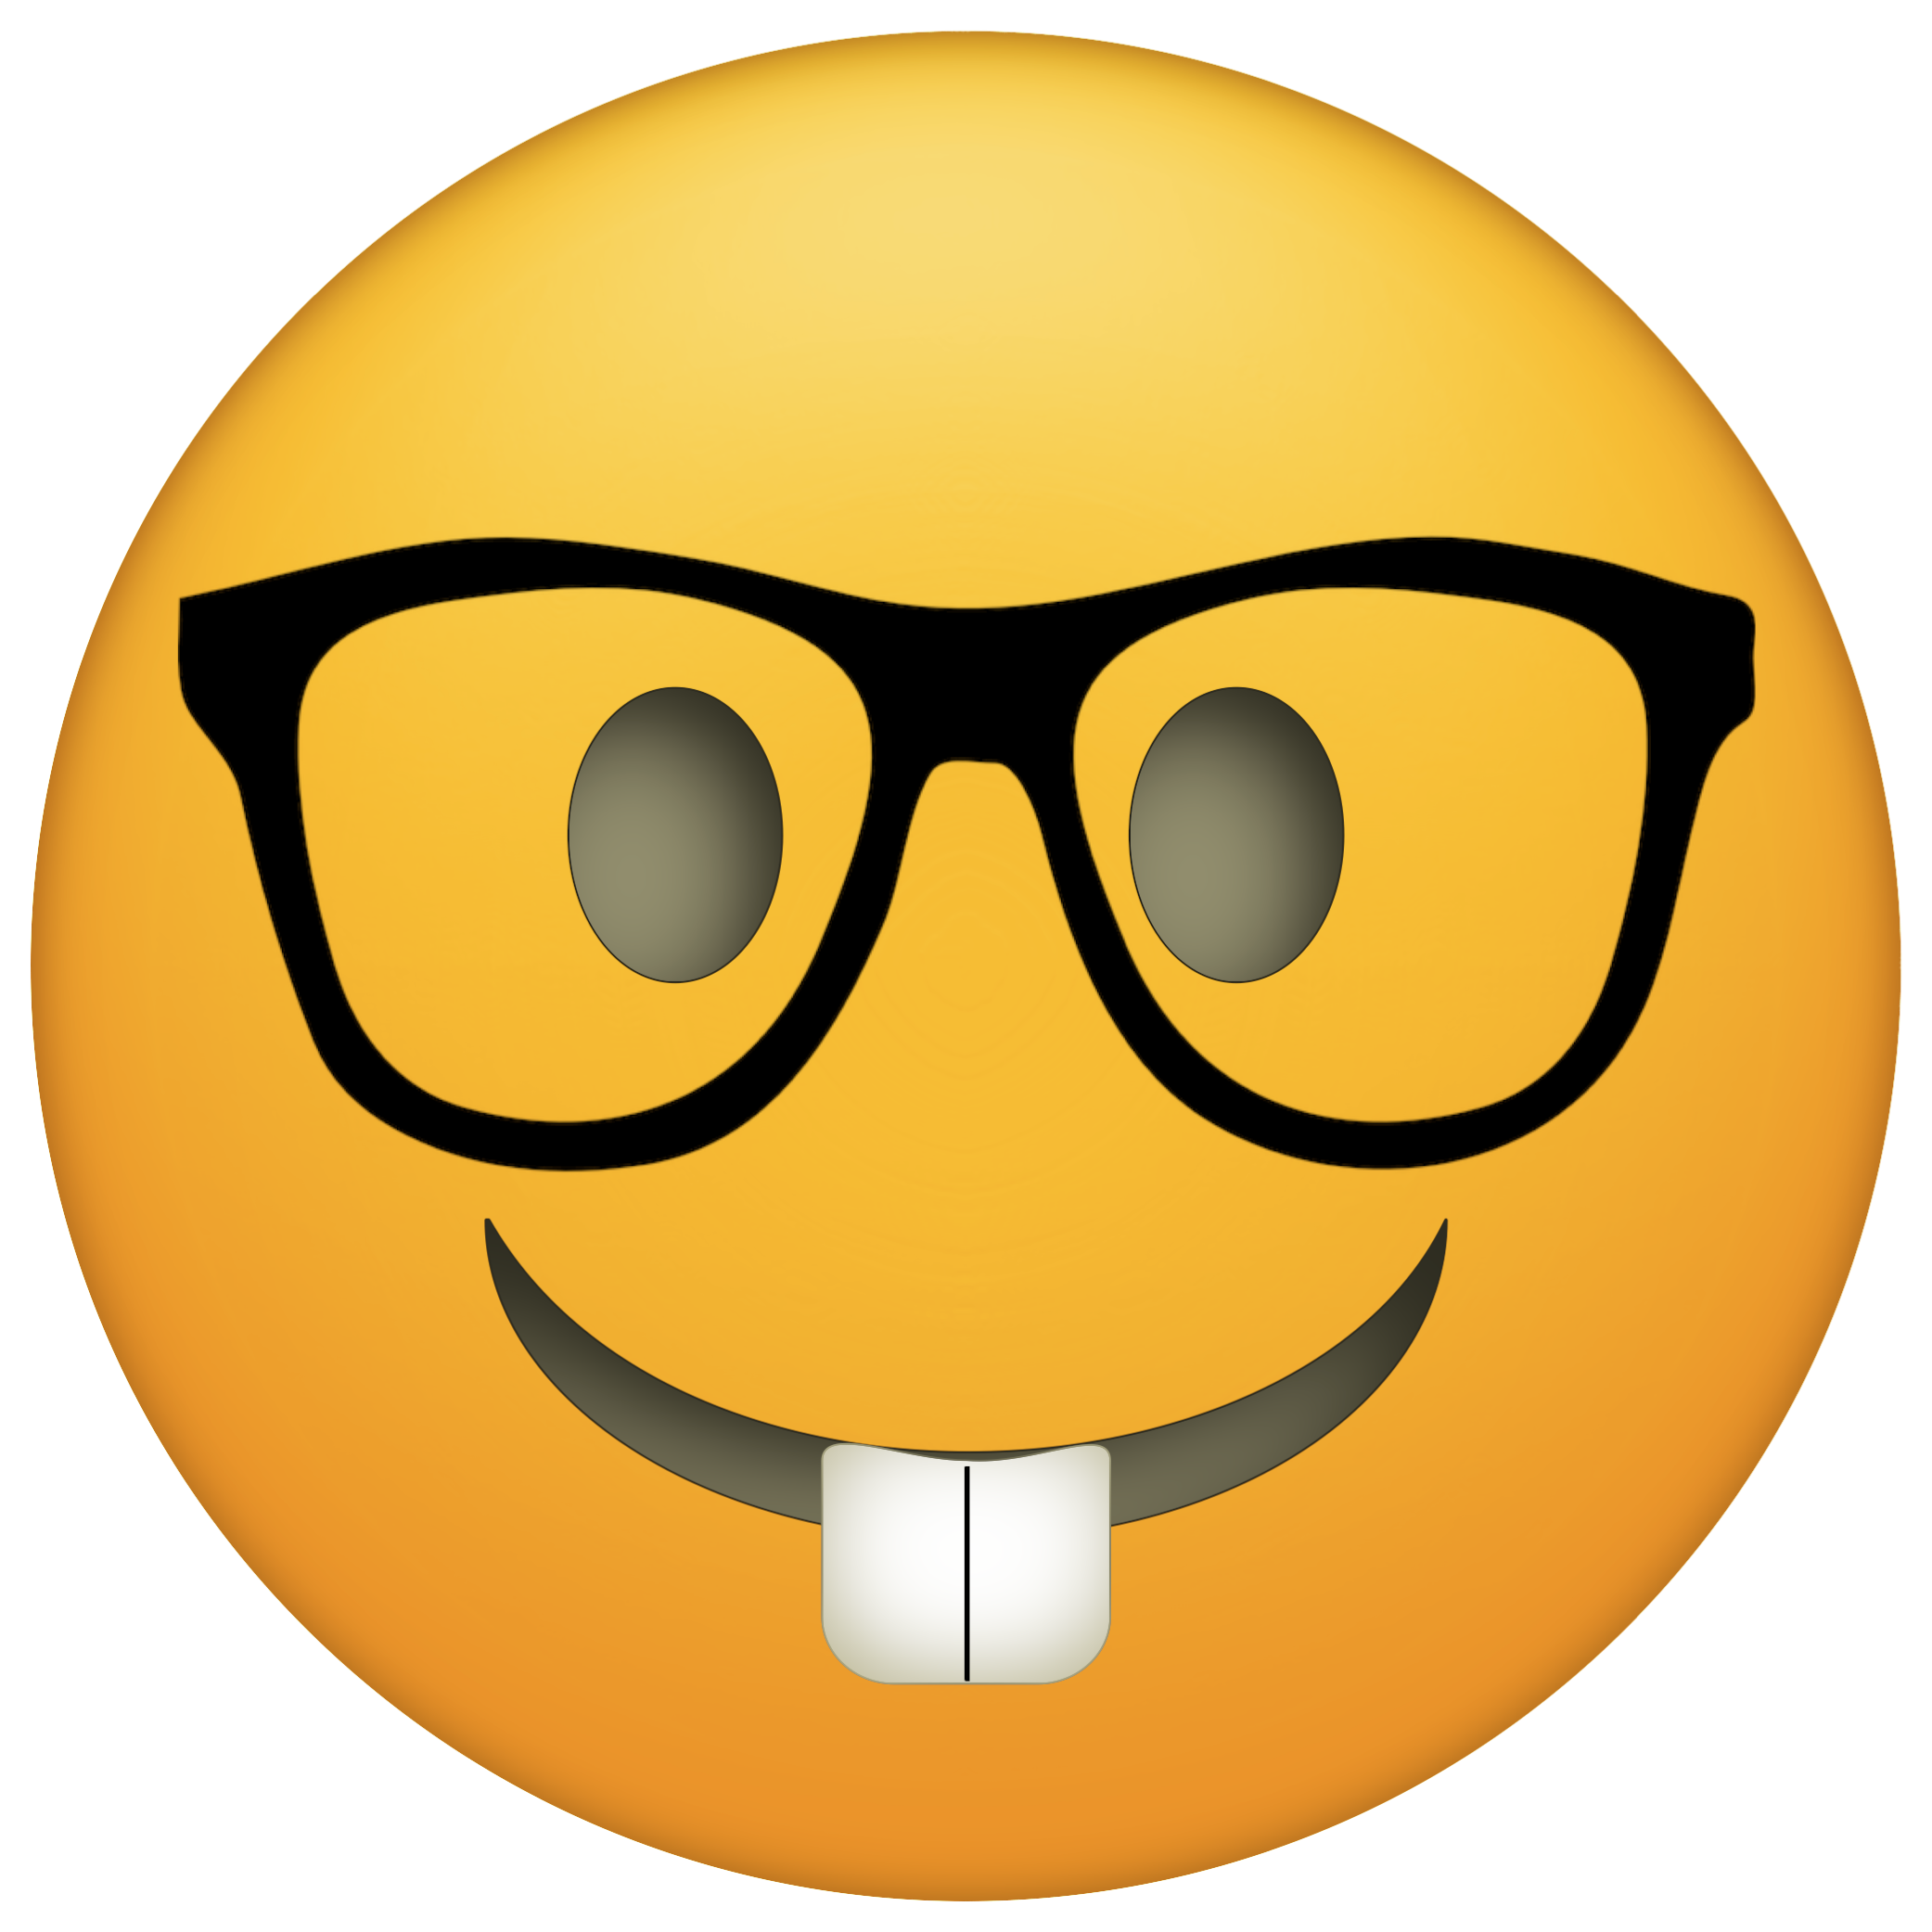 Emoji clipart student. Lessons tes teach